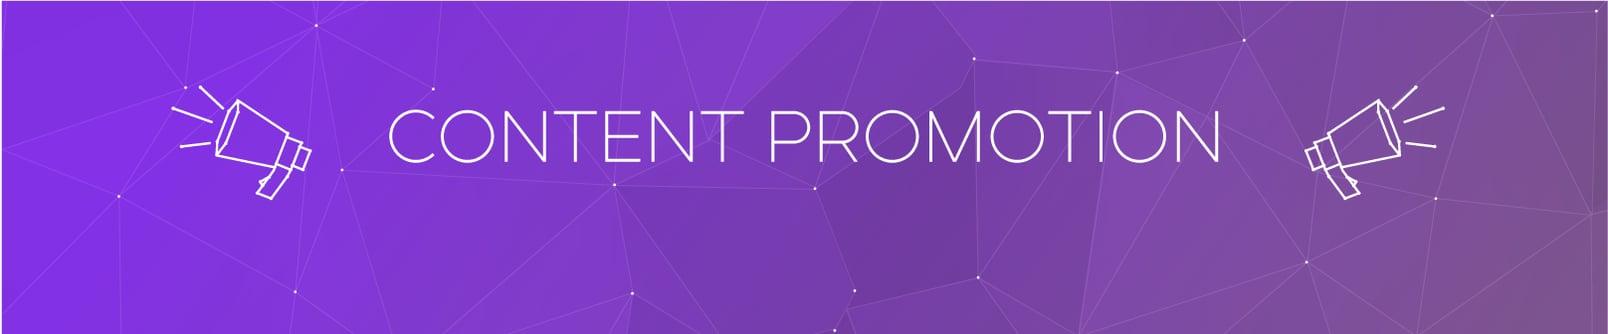 Banner-Content-Promotion-Dublin.png